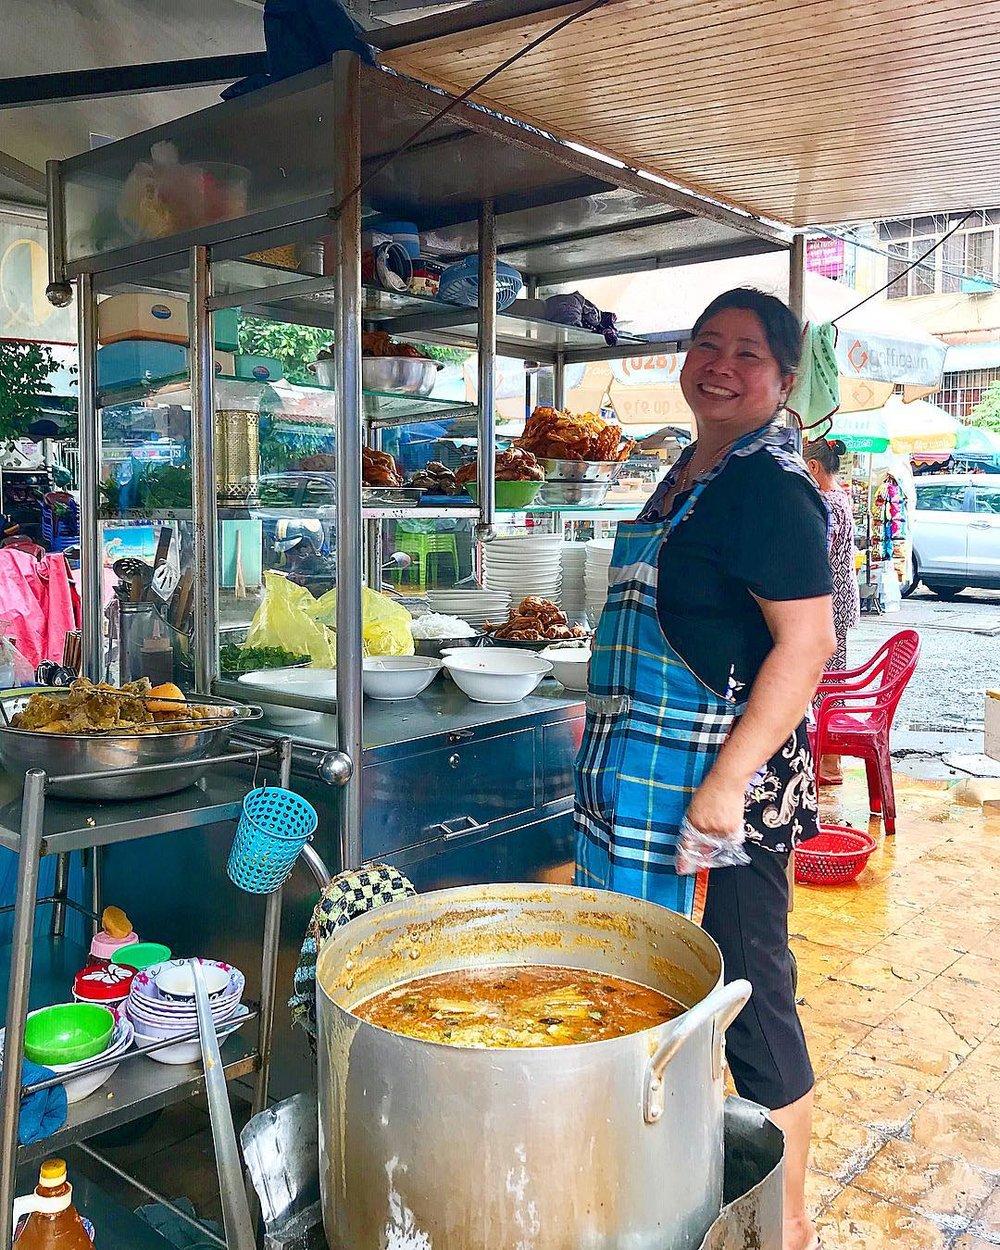 My favorite lunch lady in Saigon, Vietnam via Instagram @jonnyrouse7